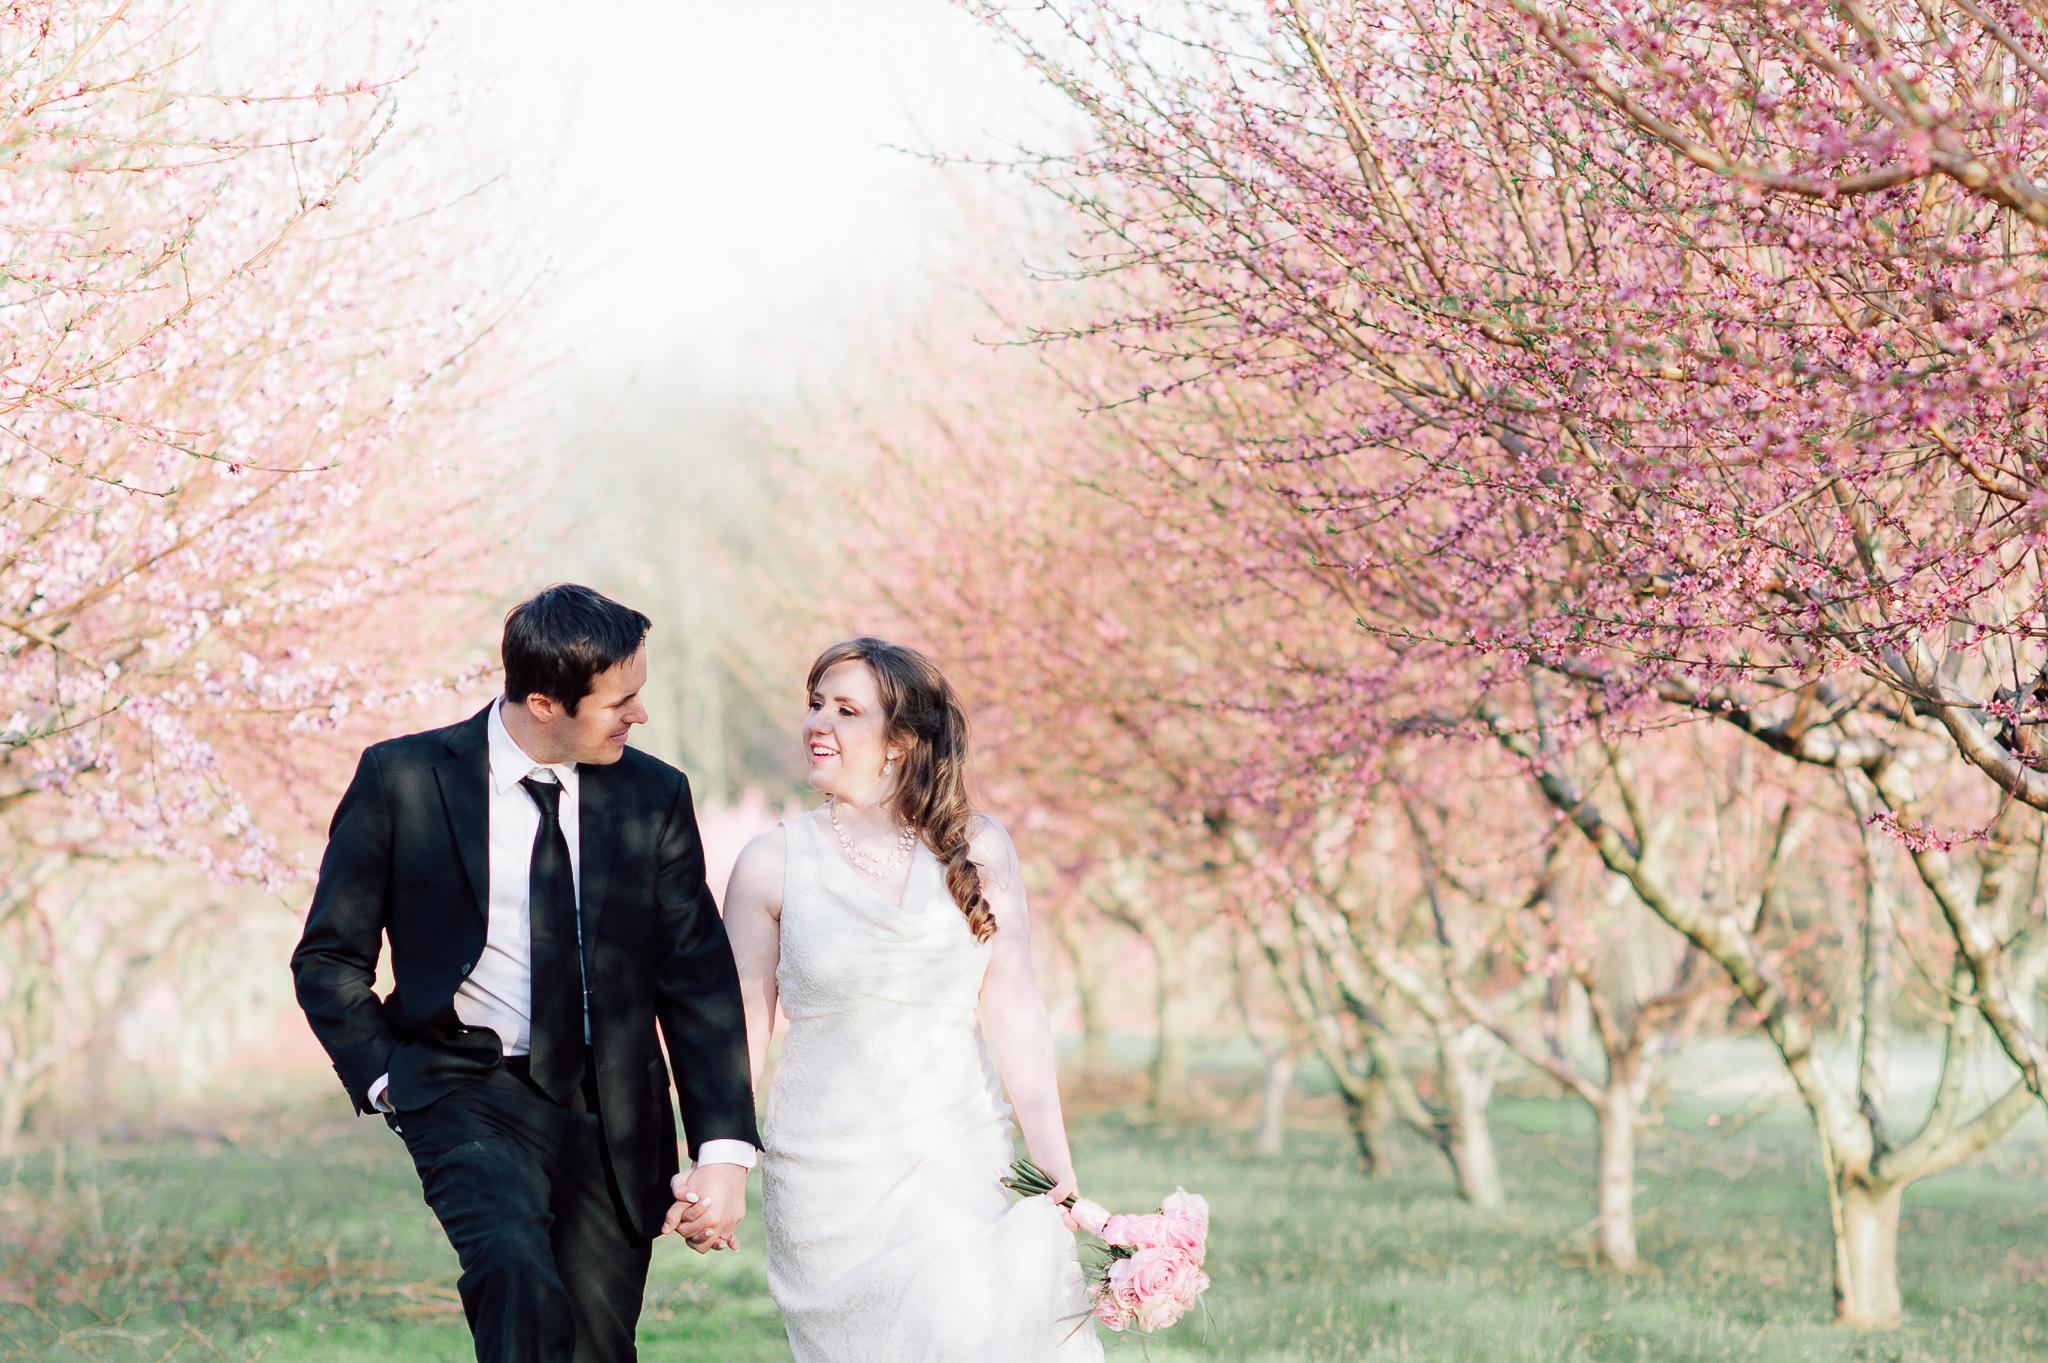 springwedding_cherryblossoms_virginiaphotographer_youseephotography_styledshoot (585).jpg